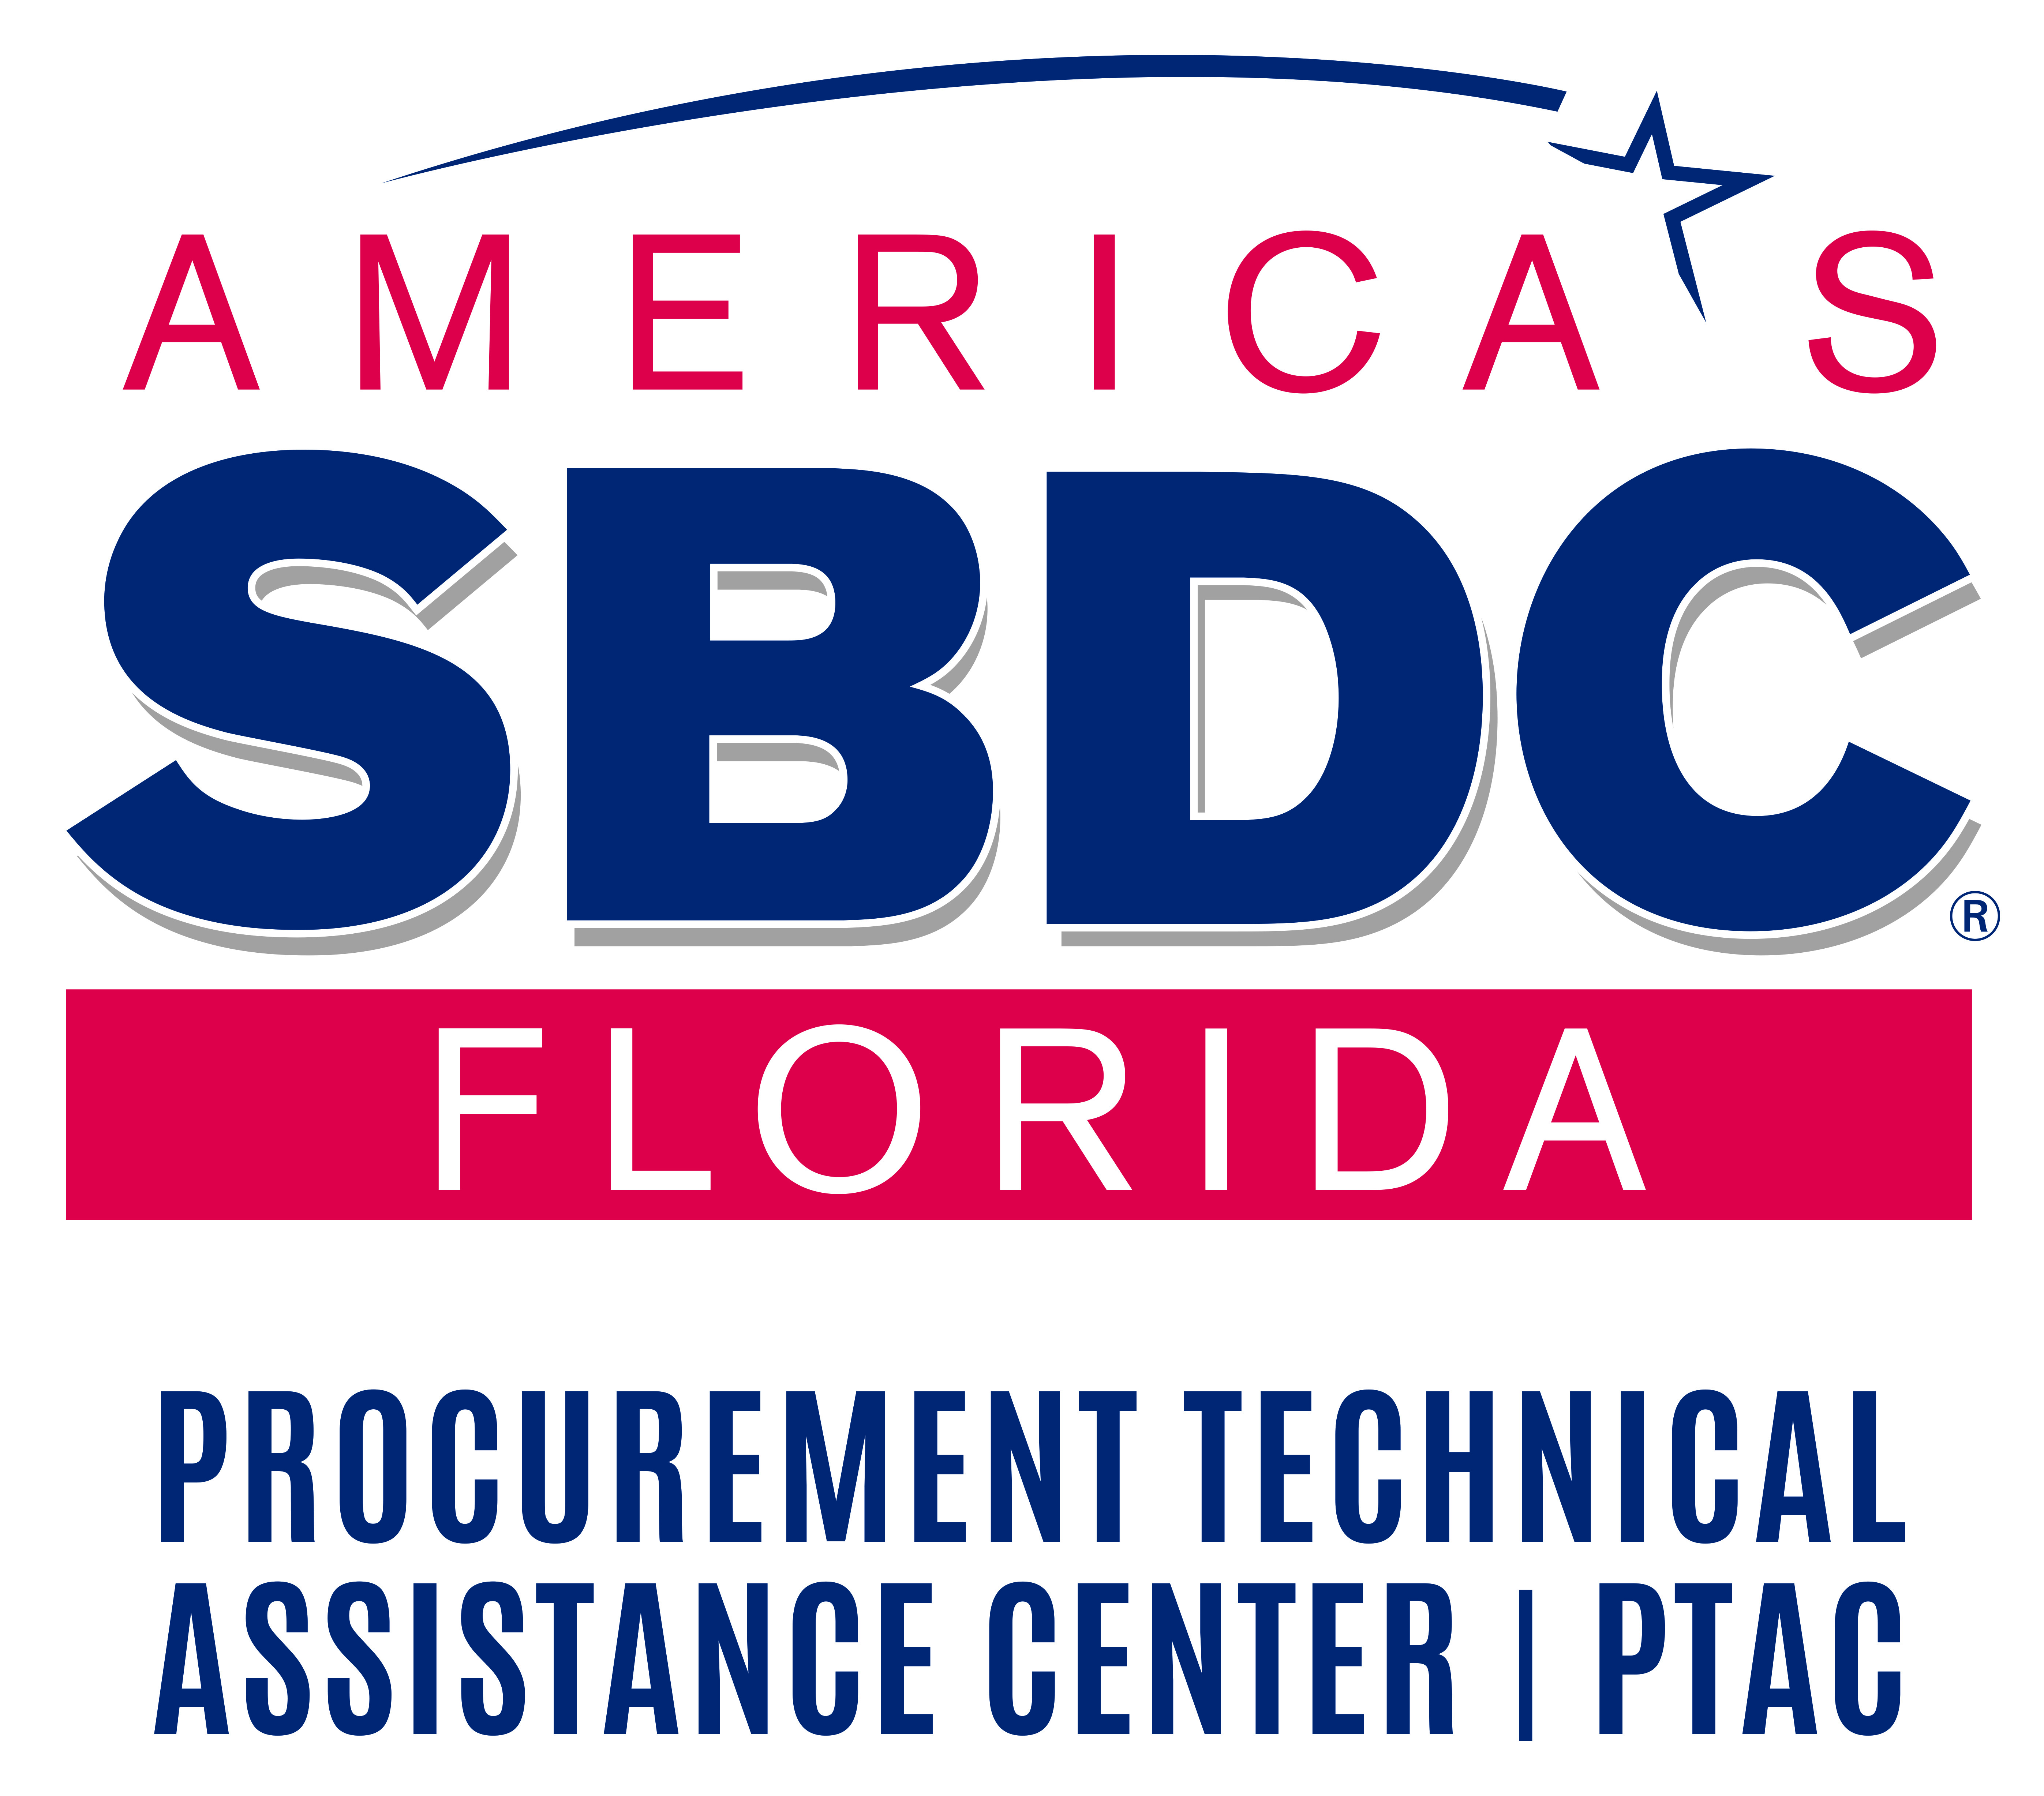 SBDC Florida